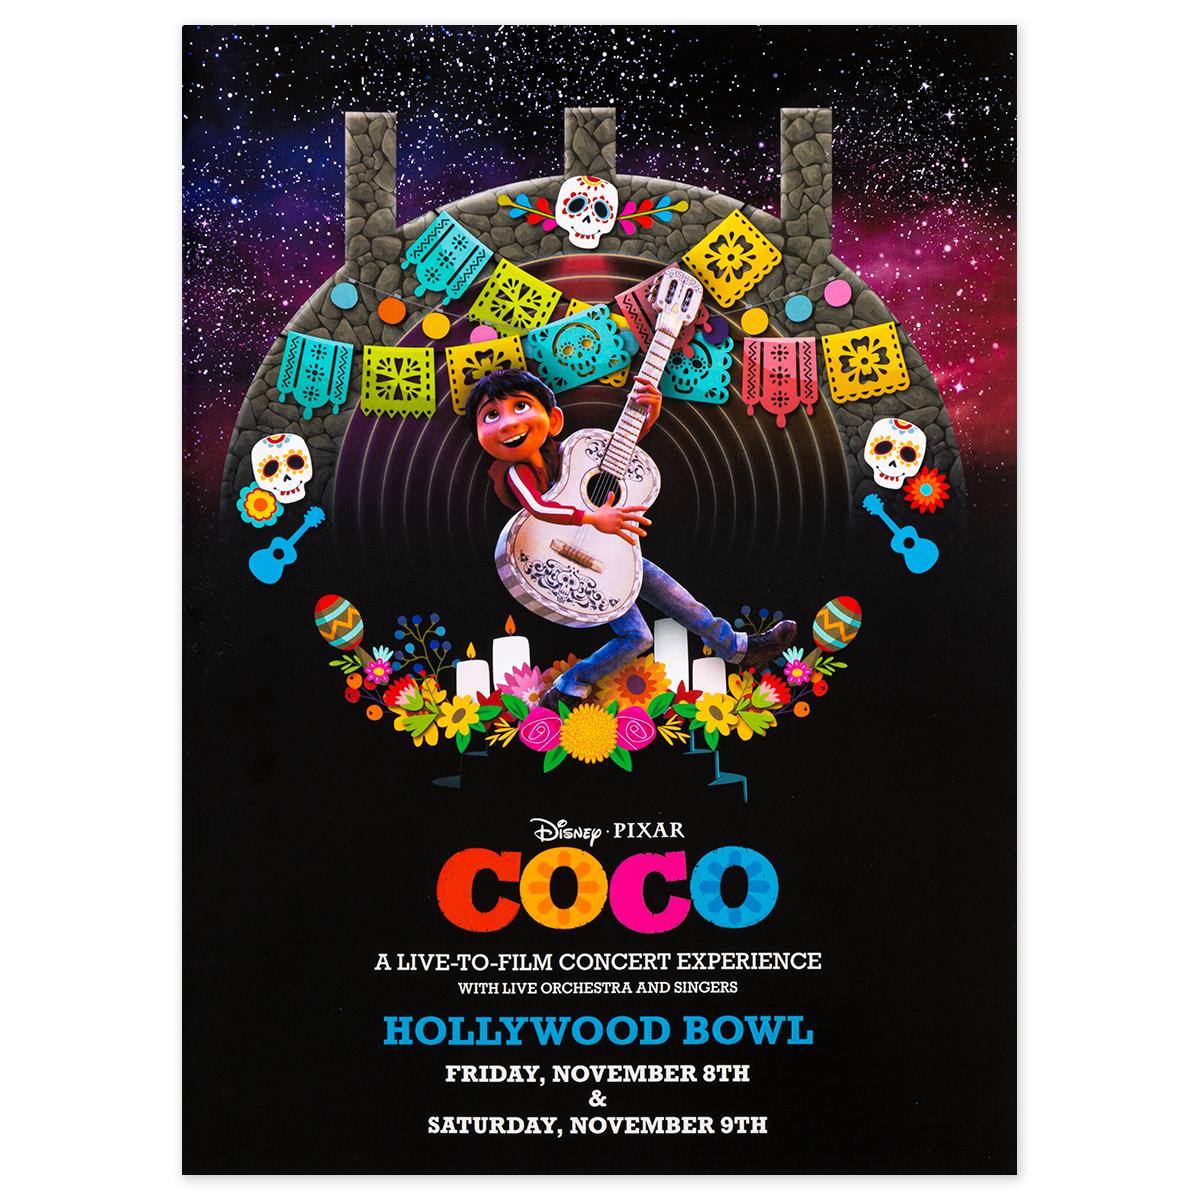 Coco Hollywood Bowl Program